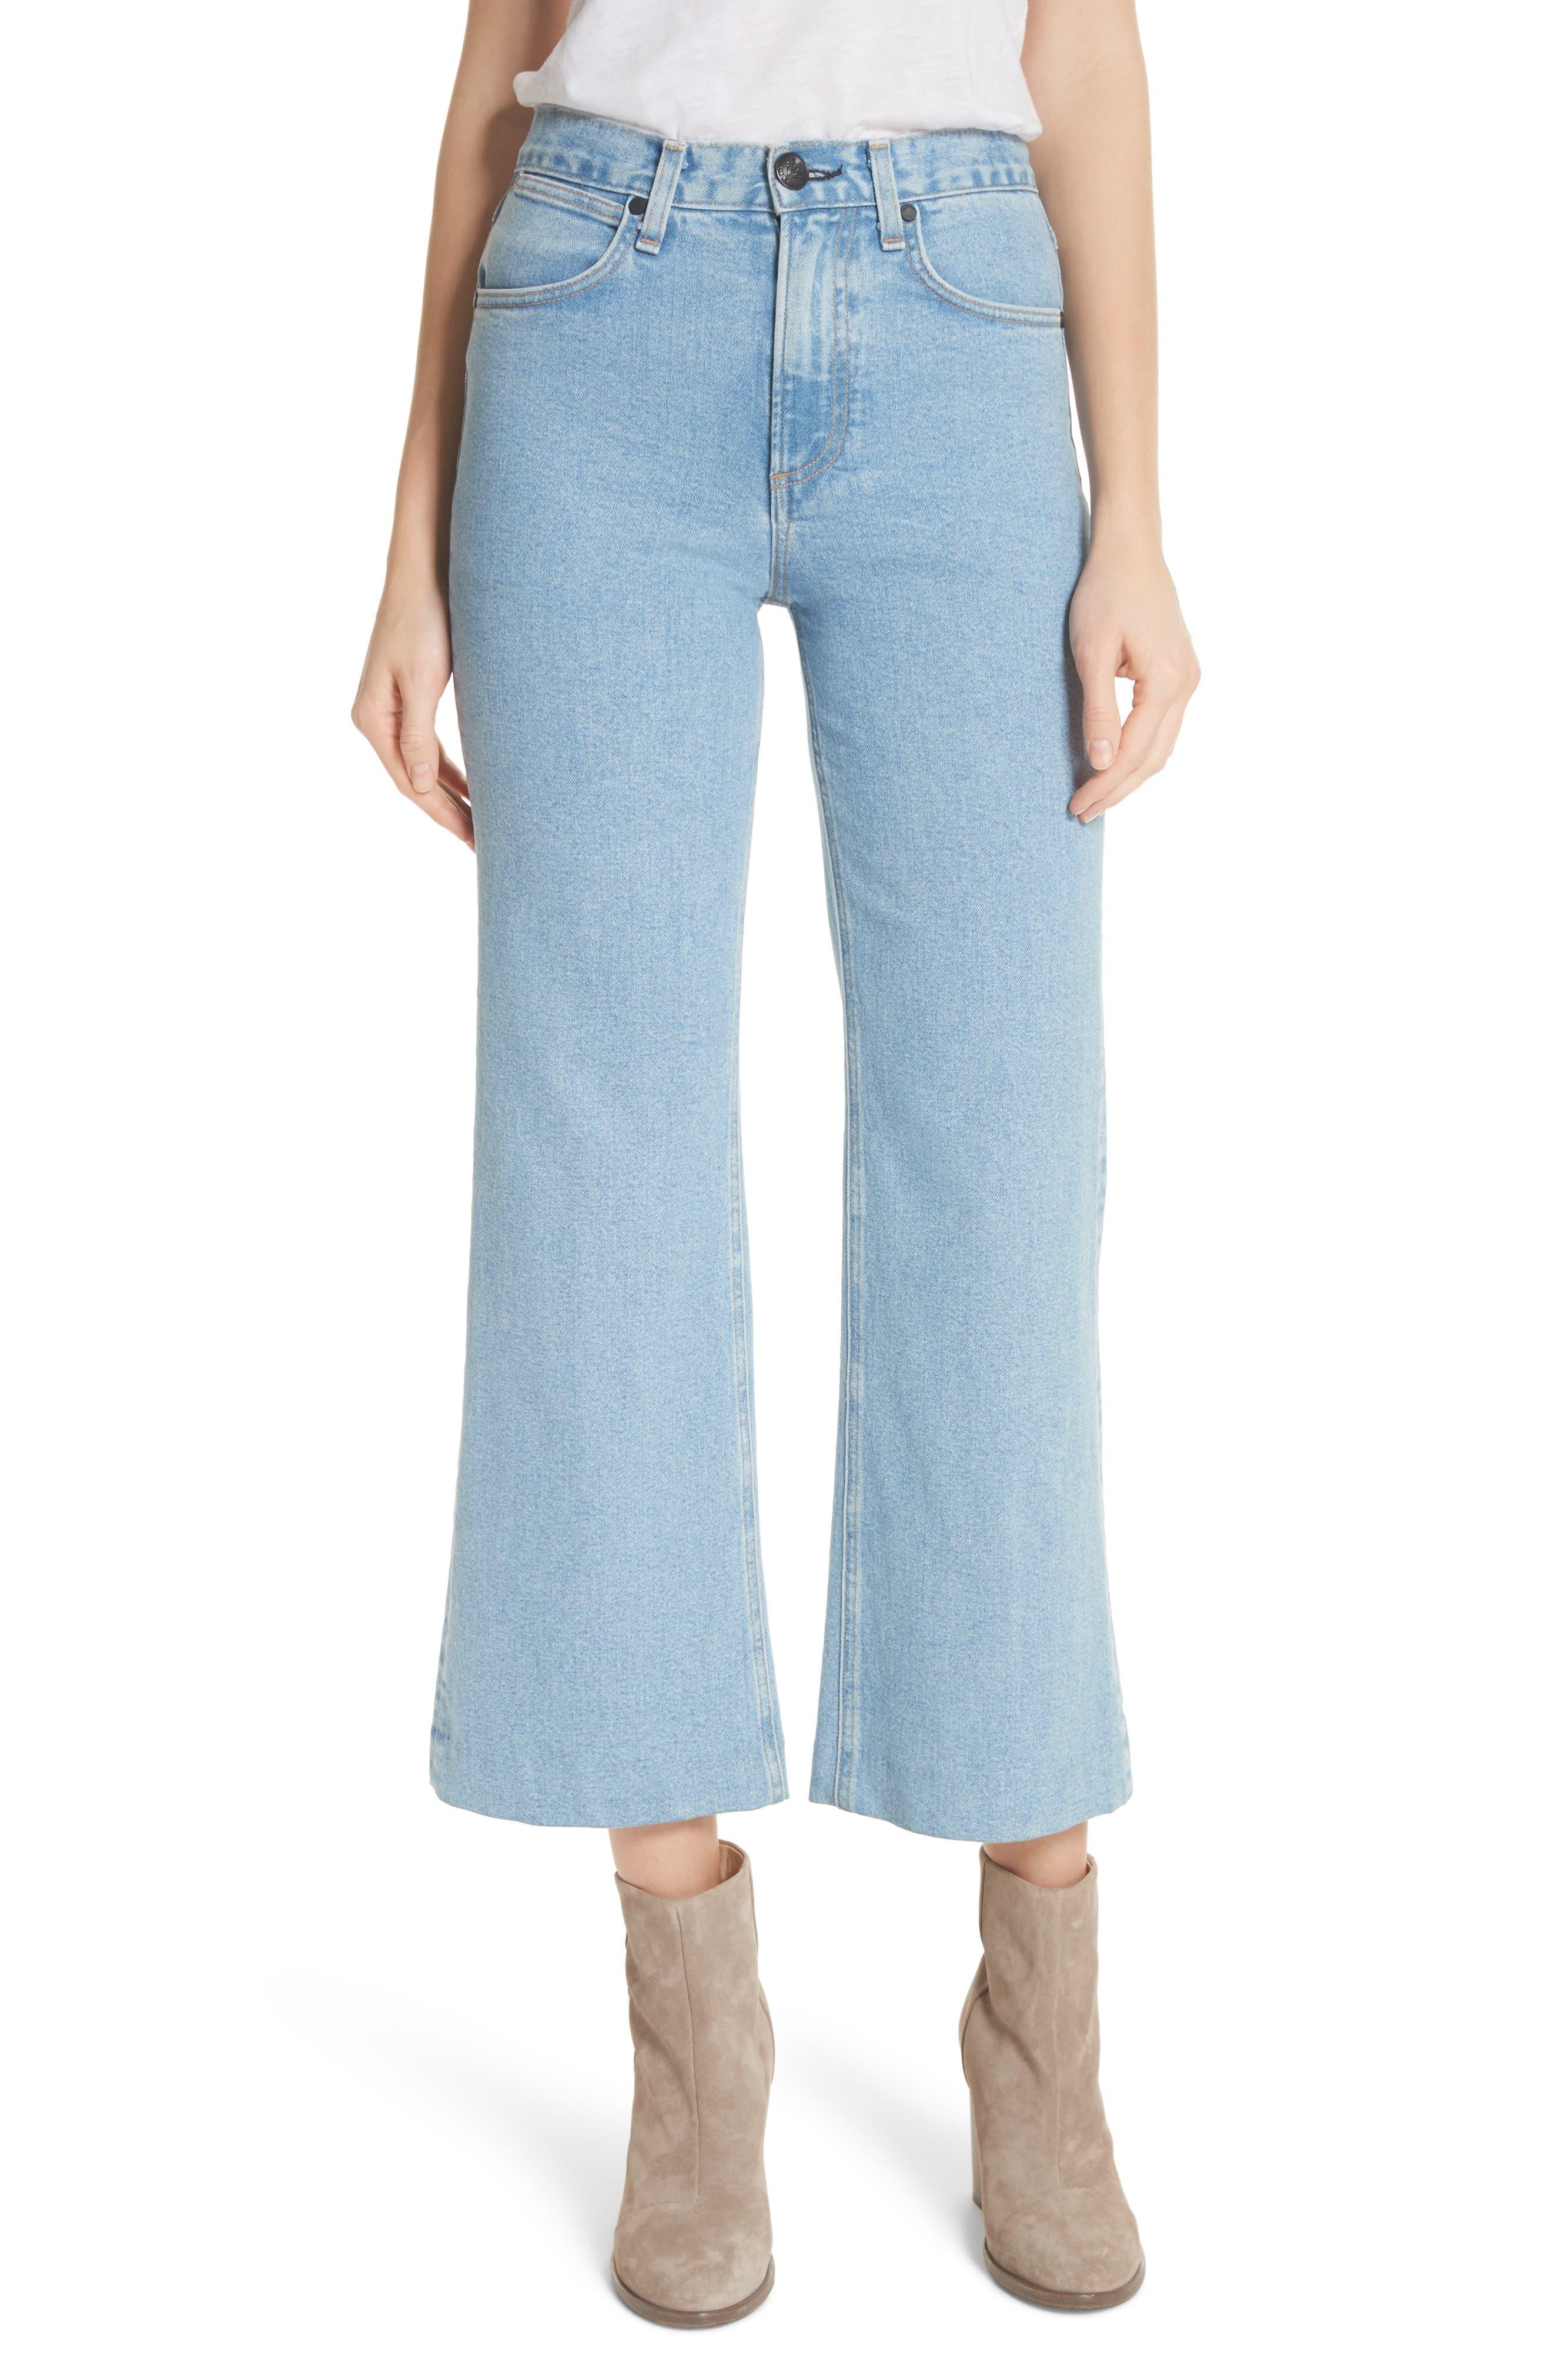 Justine High Waist Wide Leg Trouser Jeans,                             Main thumbnail 1, color,                             450